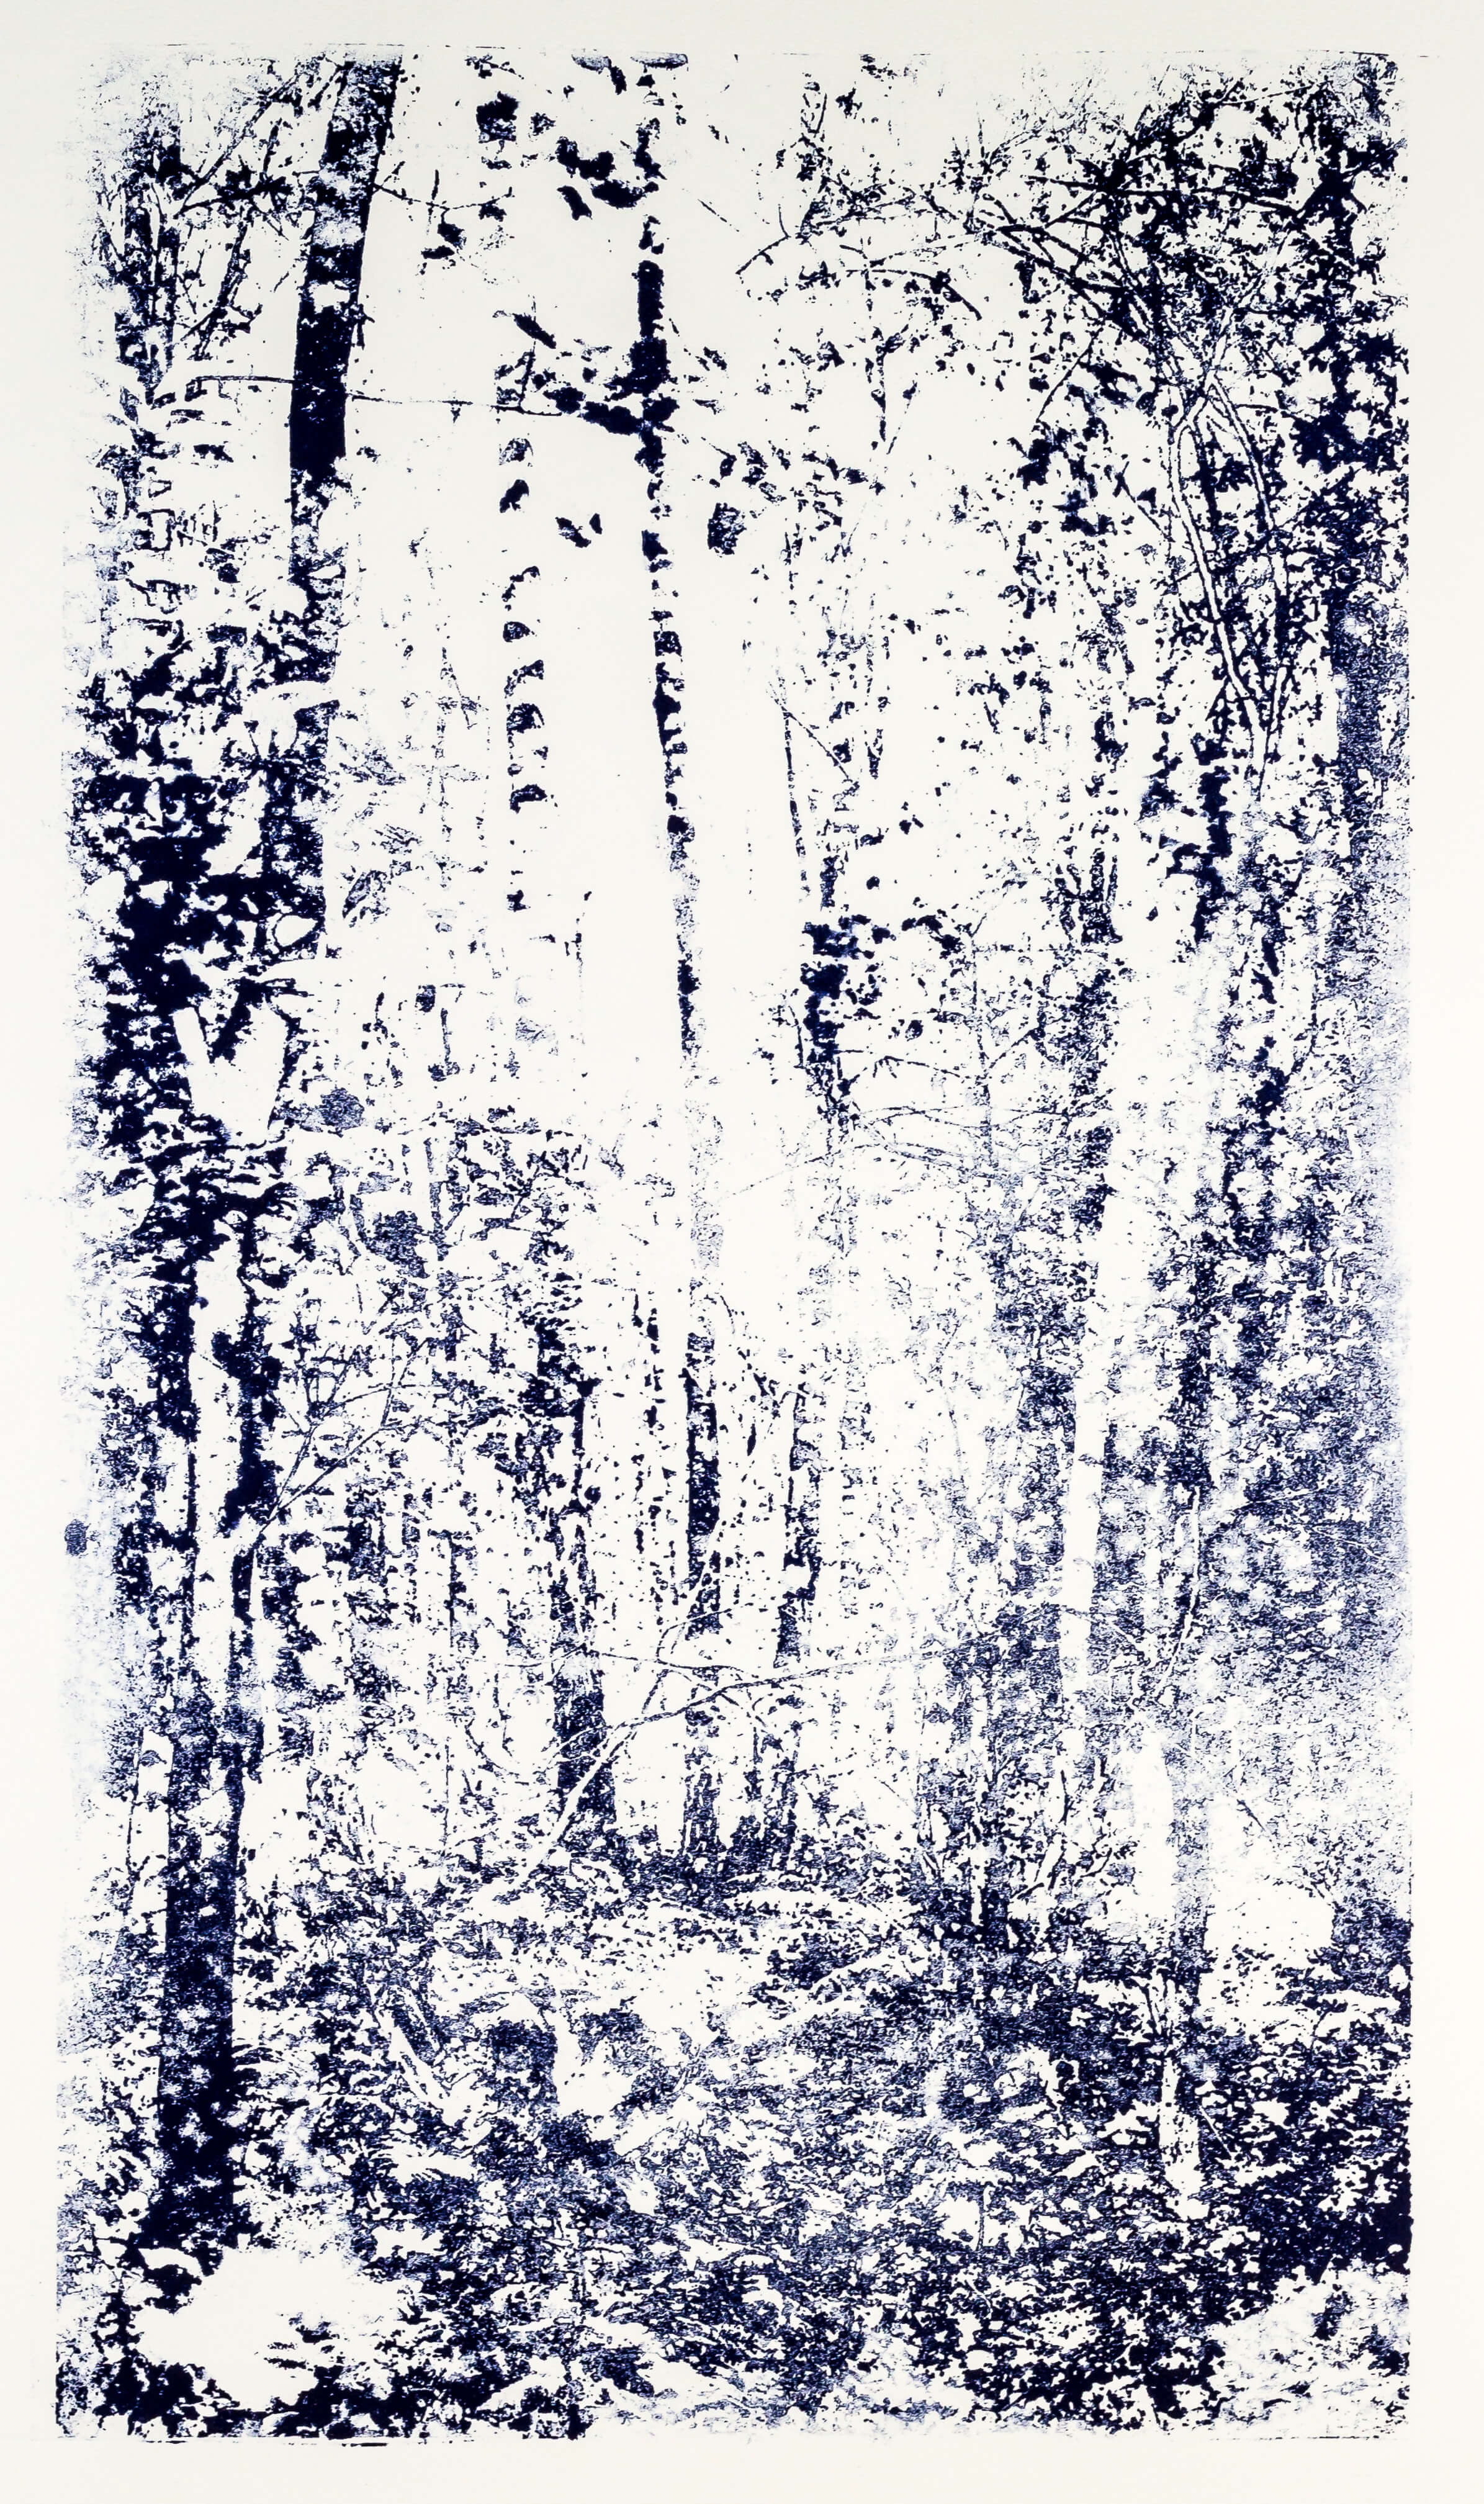 Katharina Albers, Wald XX.I-IV, 2015, Farblithographie, Unikat, 60×33 cm